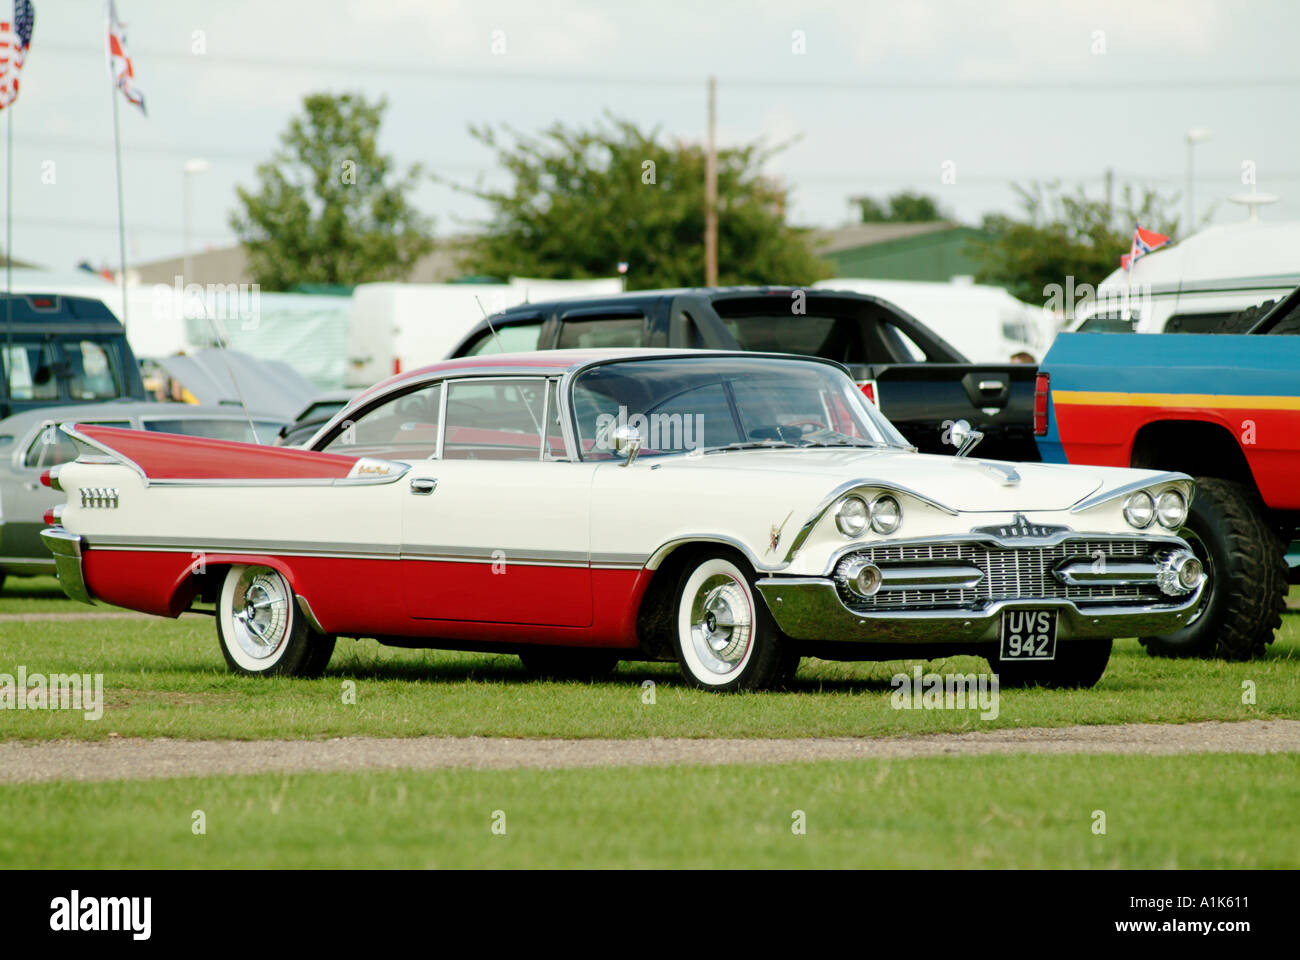 Dodge Car Stock Photos Images Alamy 1950s Cars 1950 S Fin Chrome Gas Guzzler Petrol Excessive V8 Engine Image